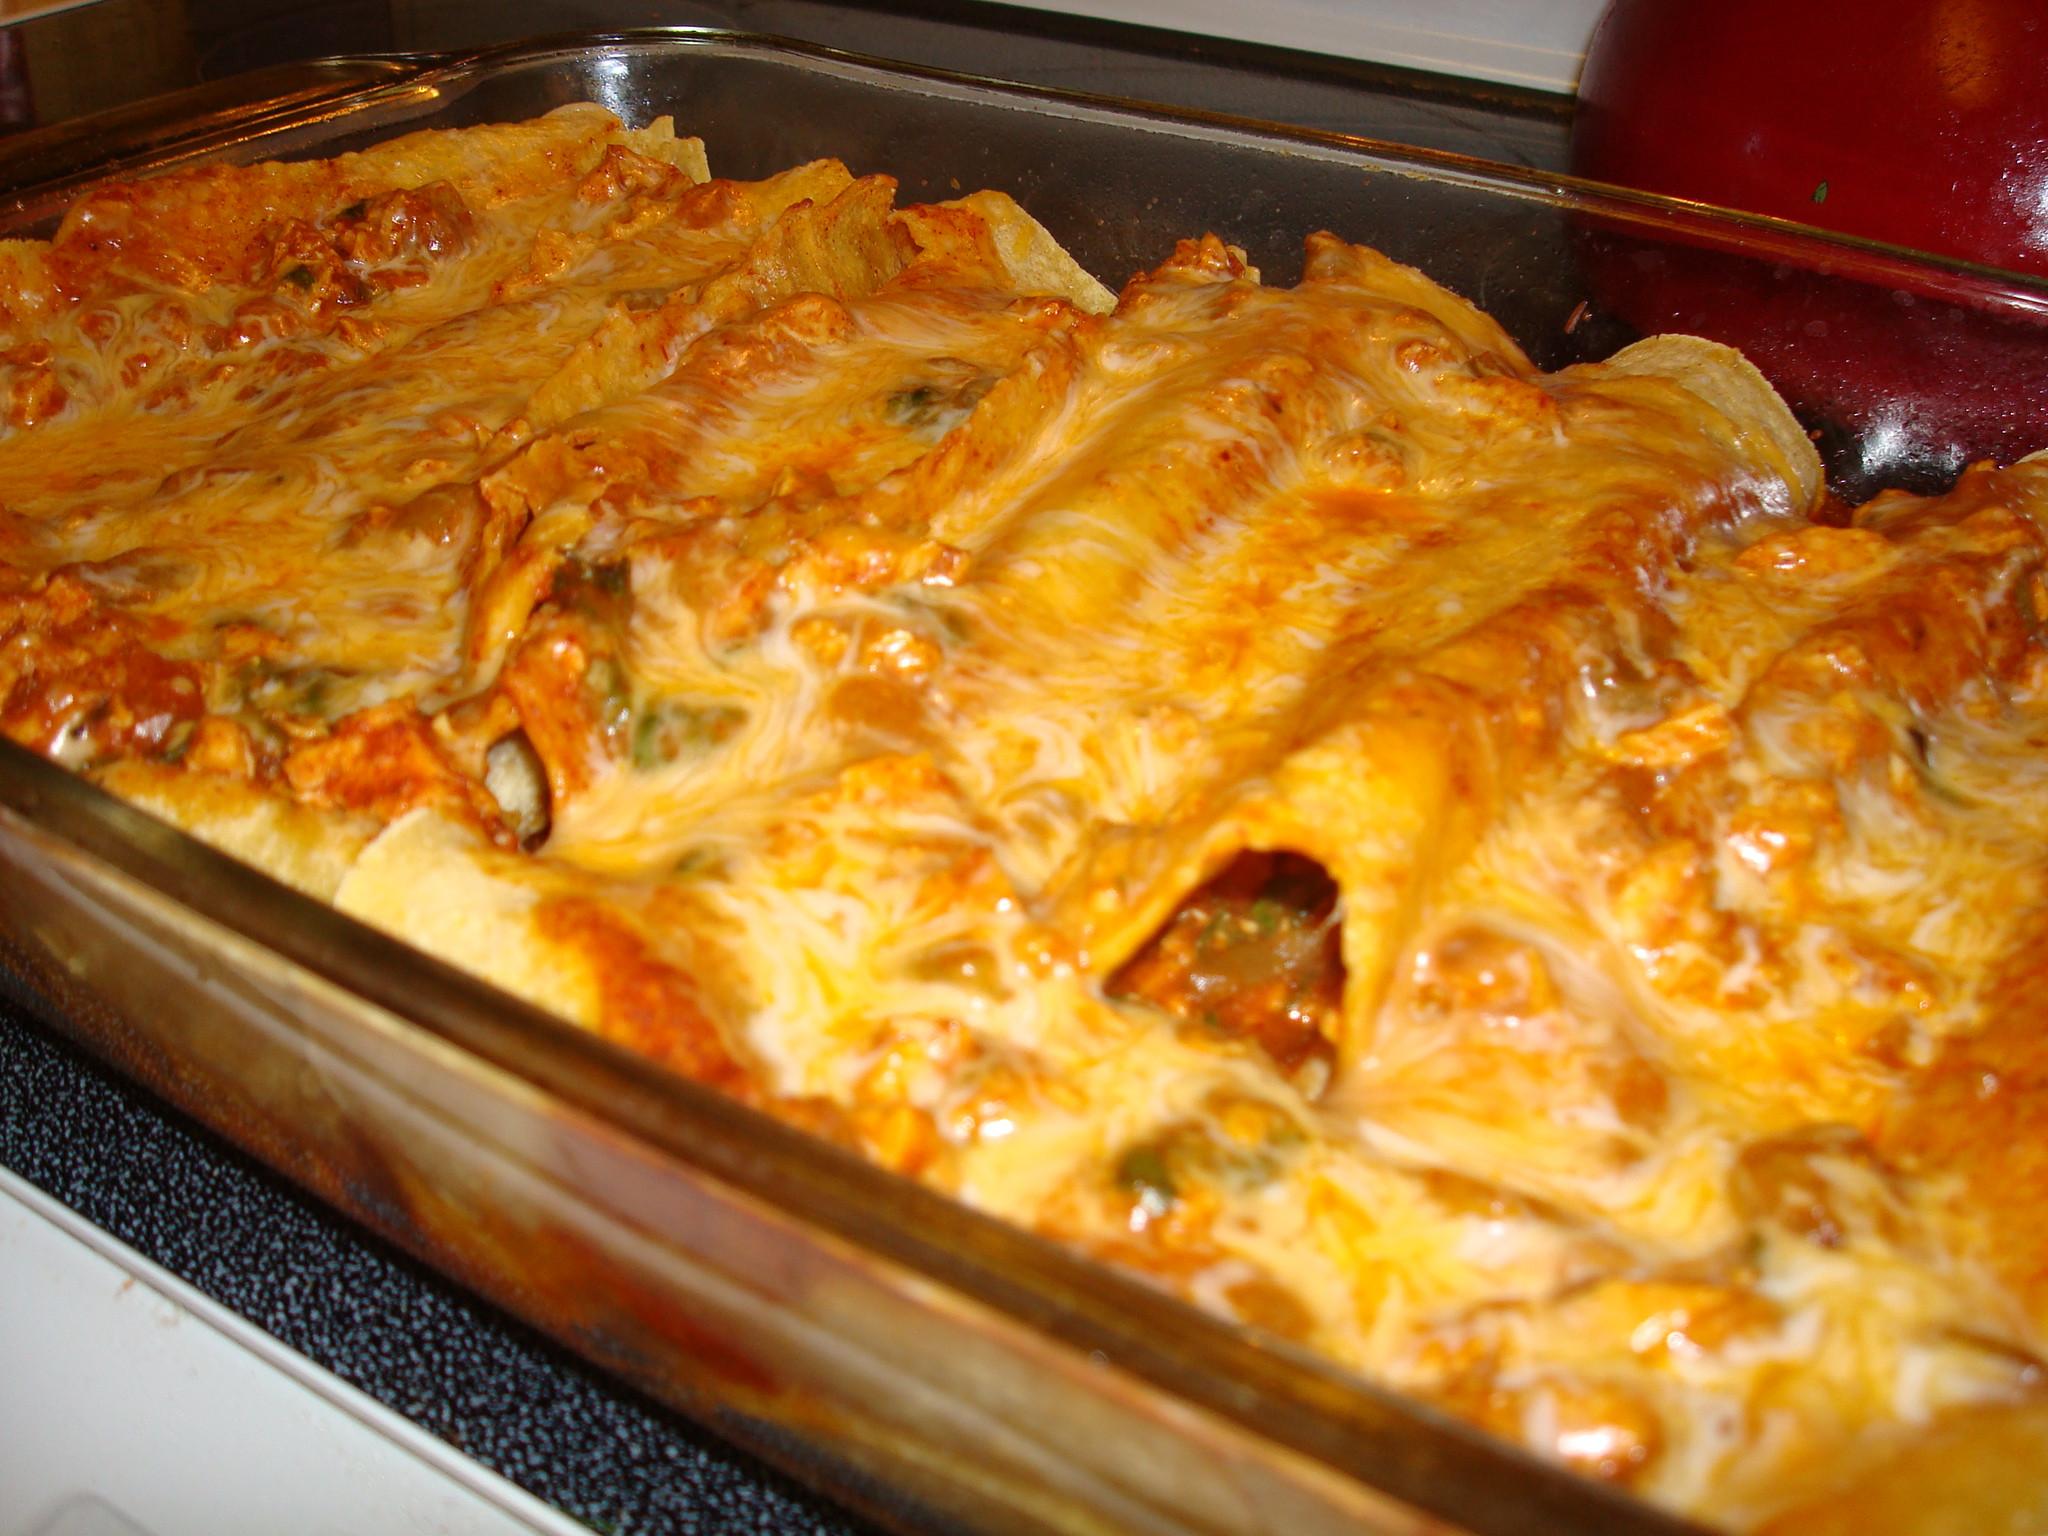 Chicken Enchilada Casserole Healthy  Healthy Chicken Enchilada Casserole